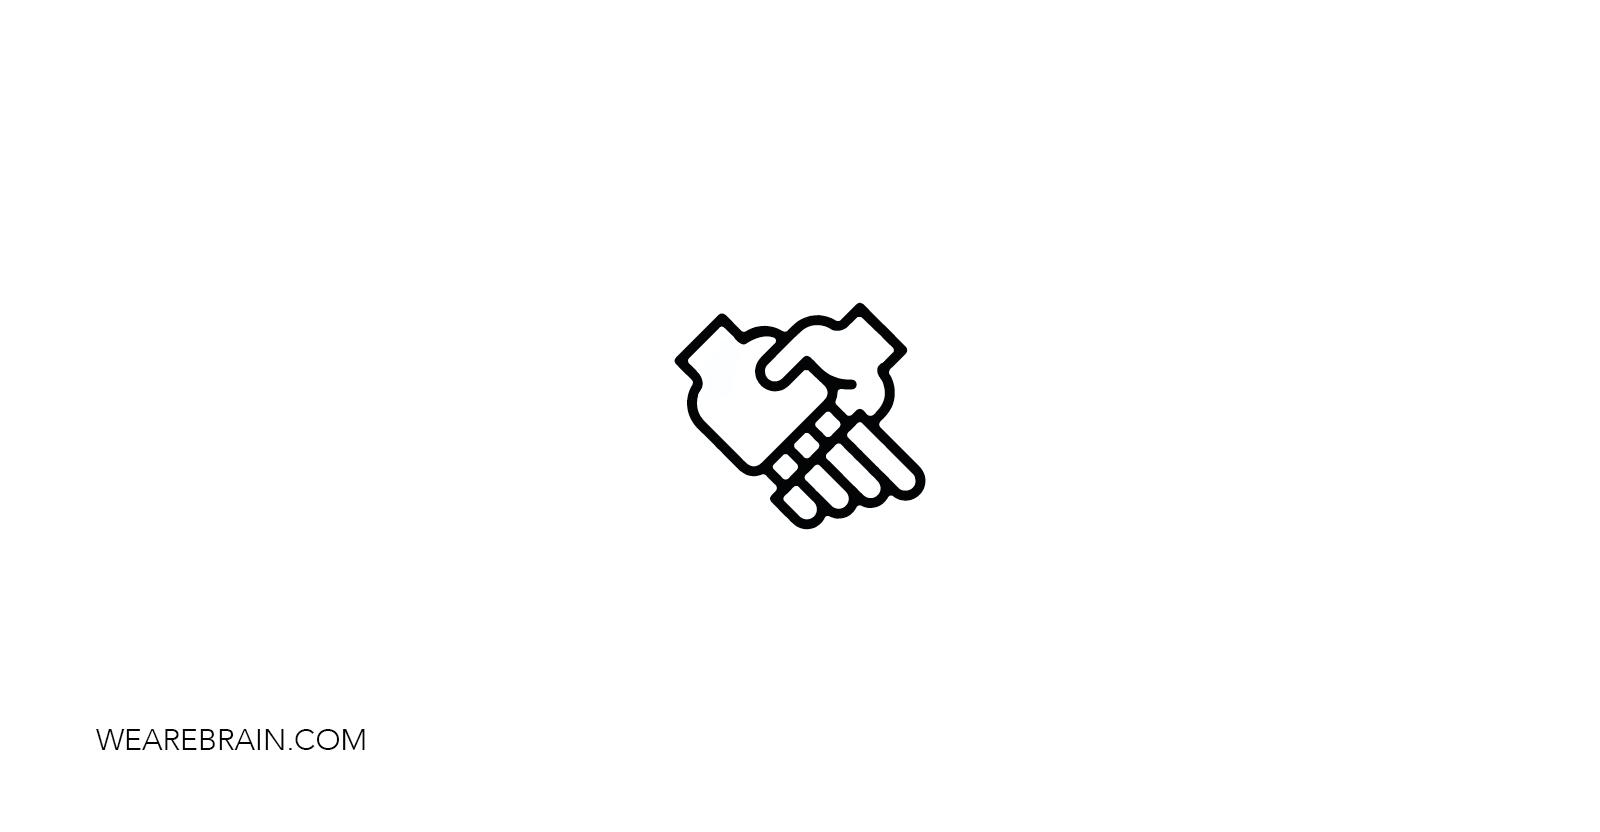 icon representing a handshake